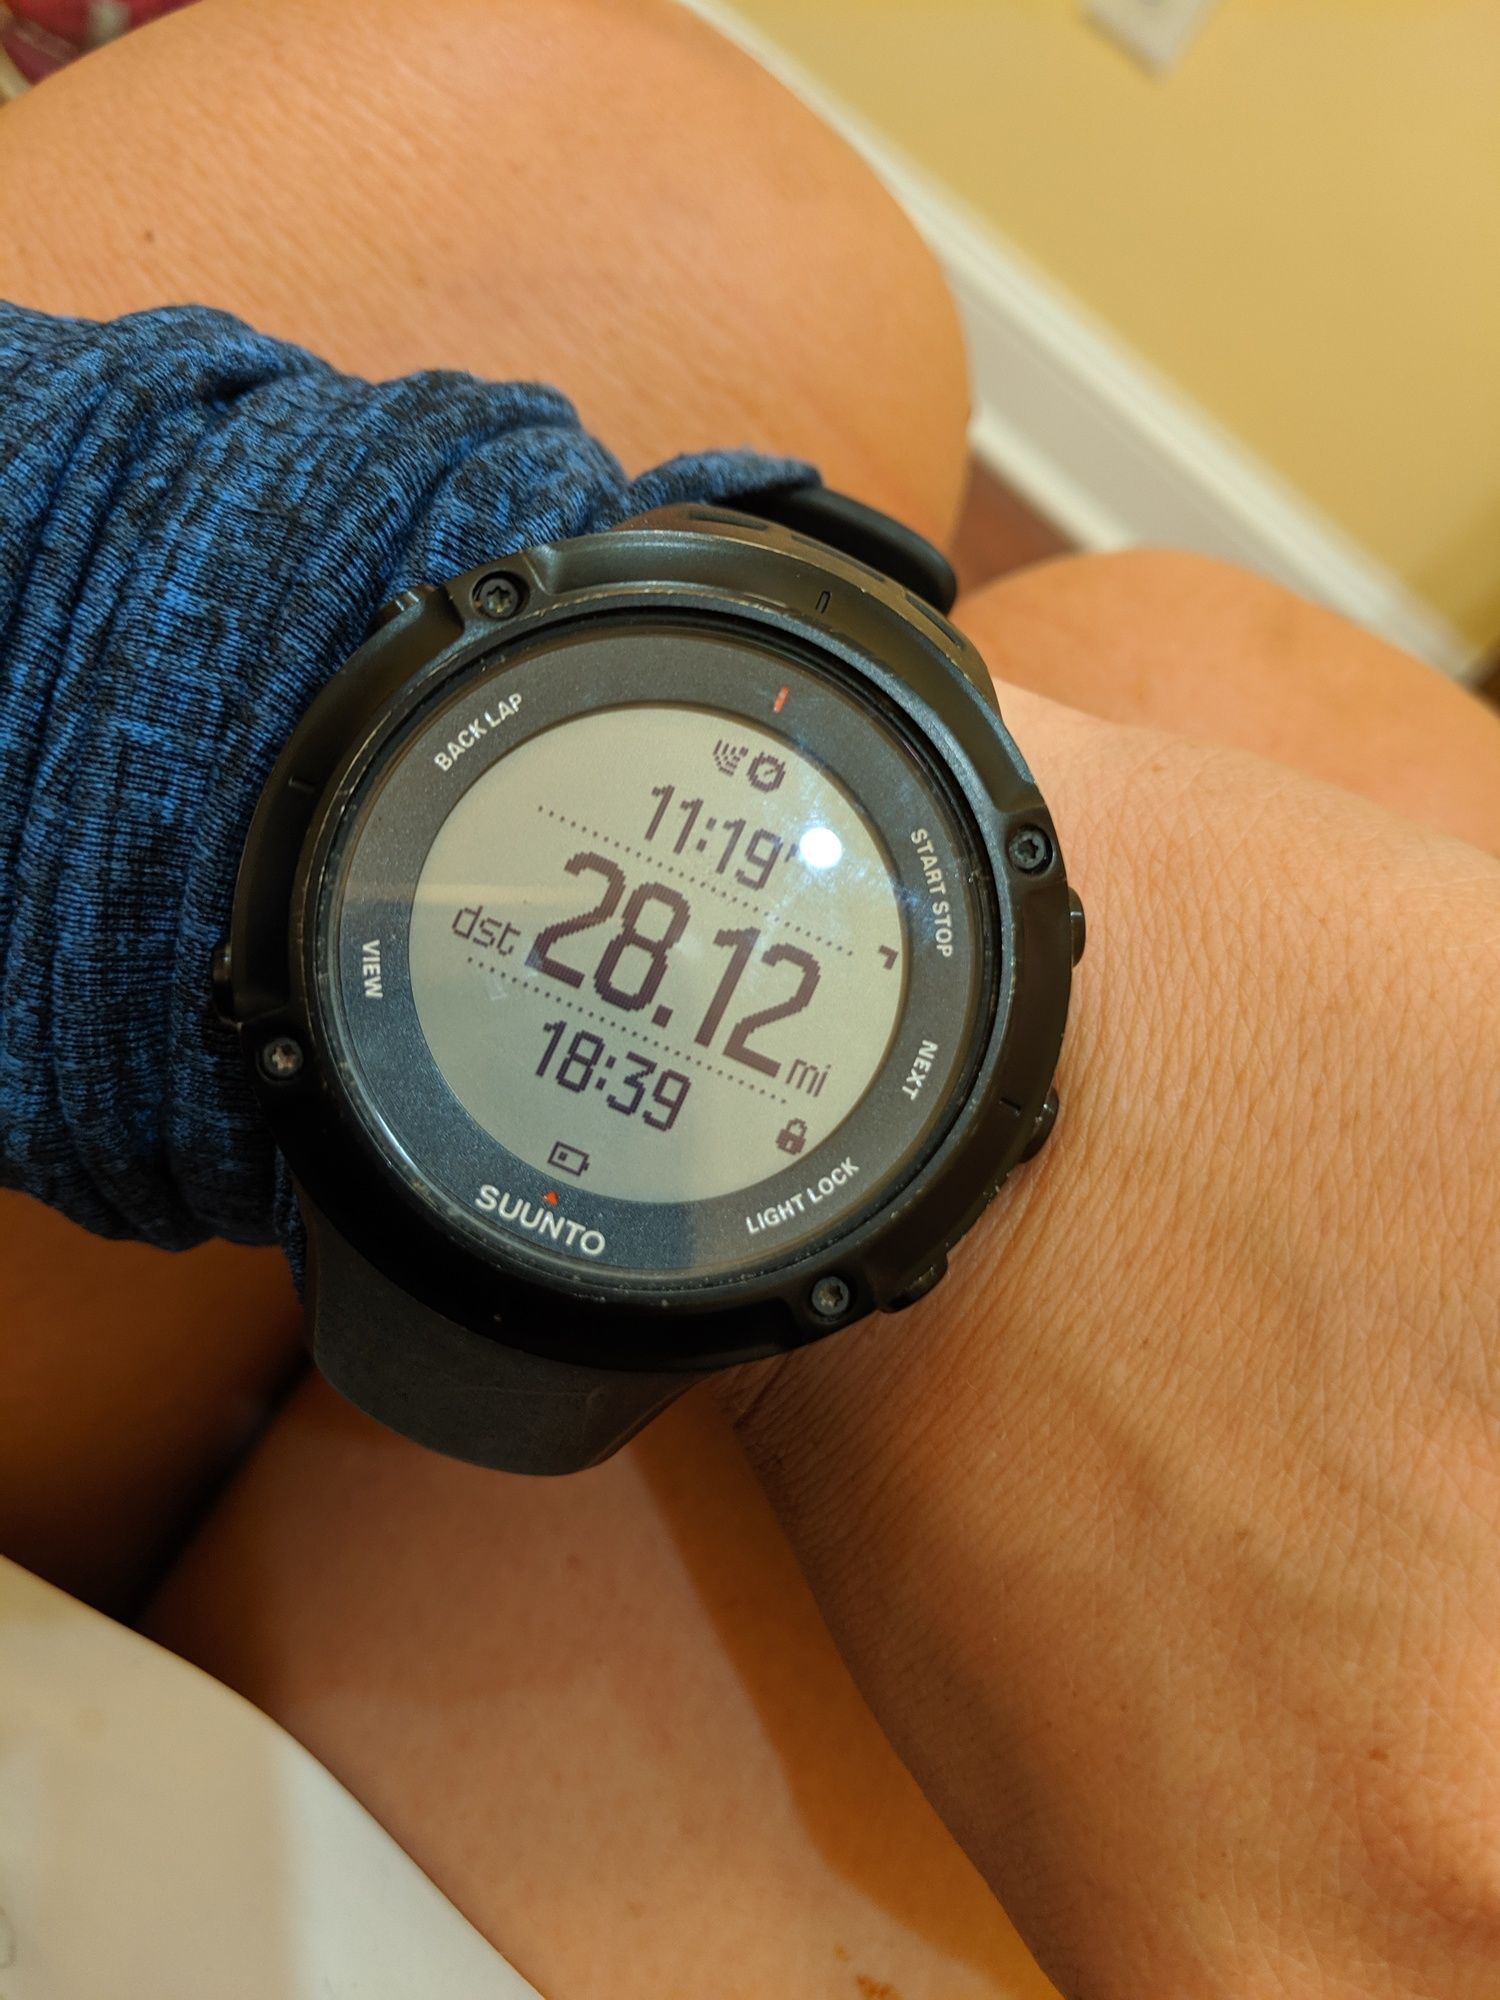 Liz Thomas wearing the Suunto Ambit3 Peak GPS watch.